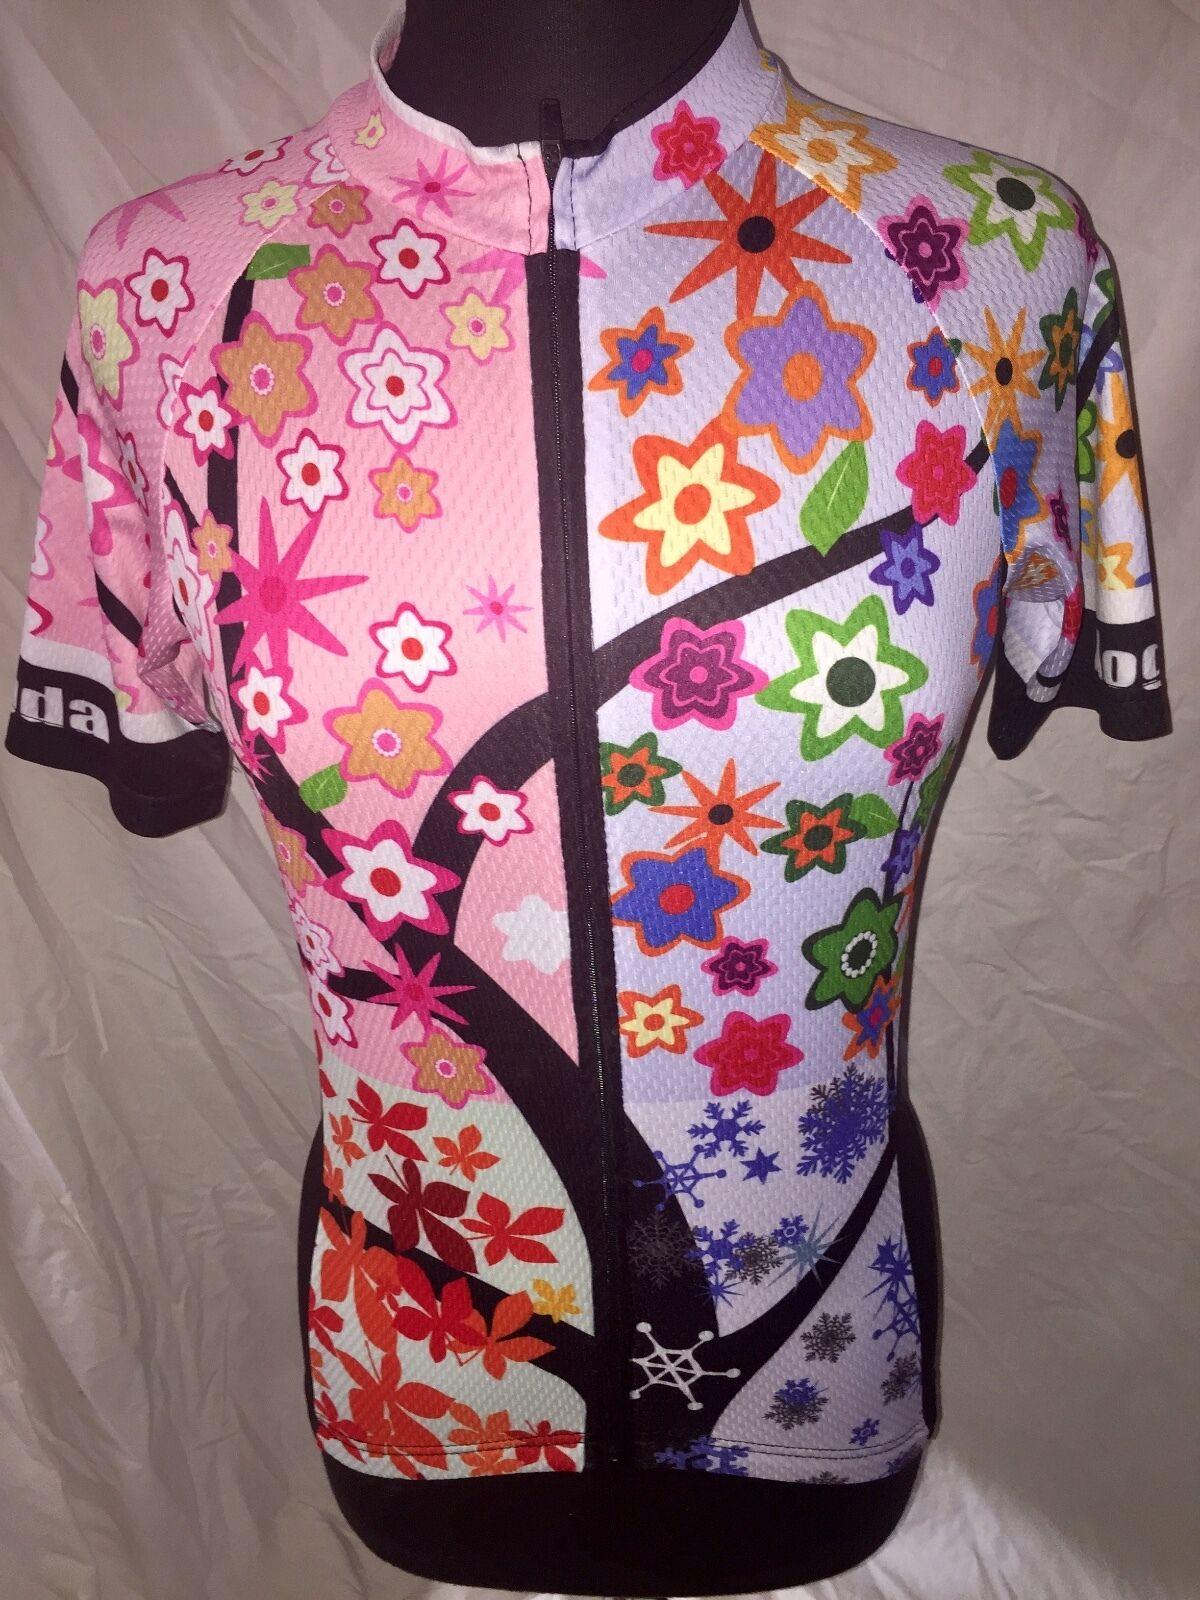 Aogda Cycling Biking Jersey Flowers Leaves Snowflakes Full Zipper Women's Medium